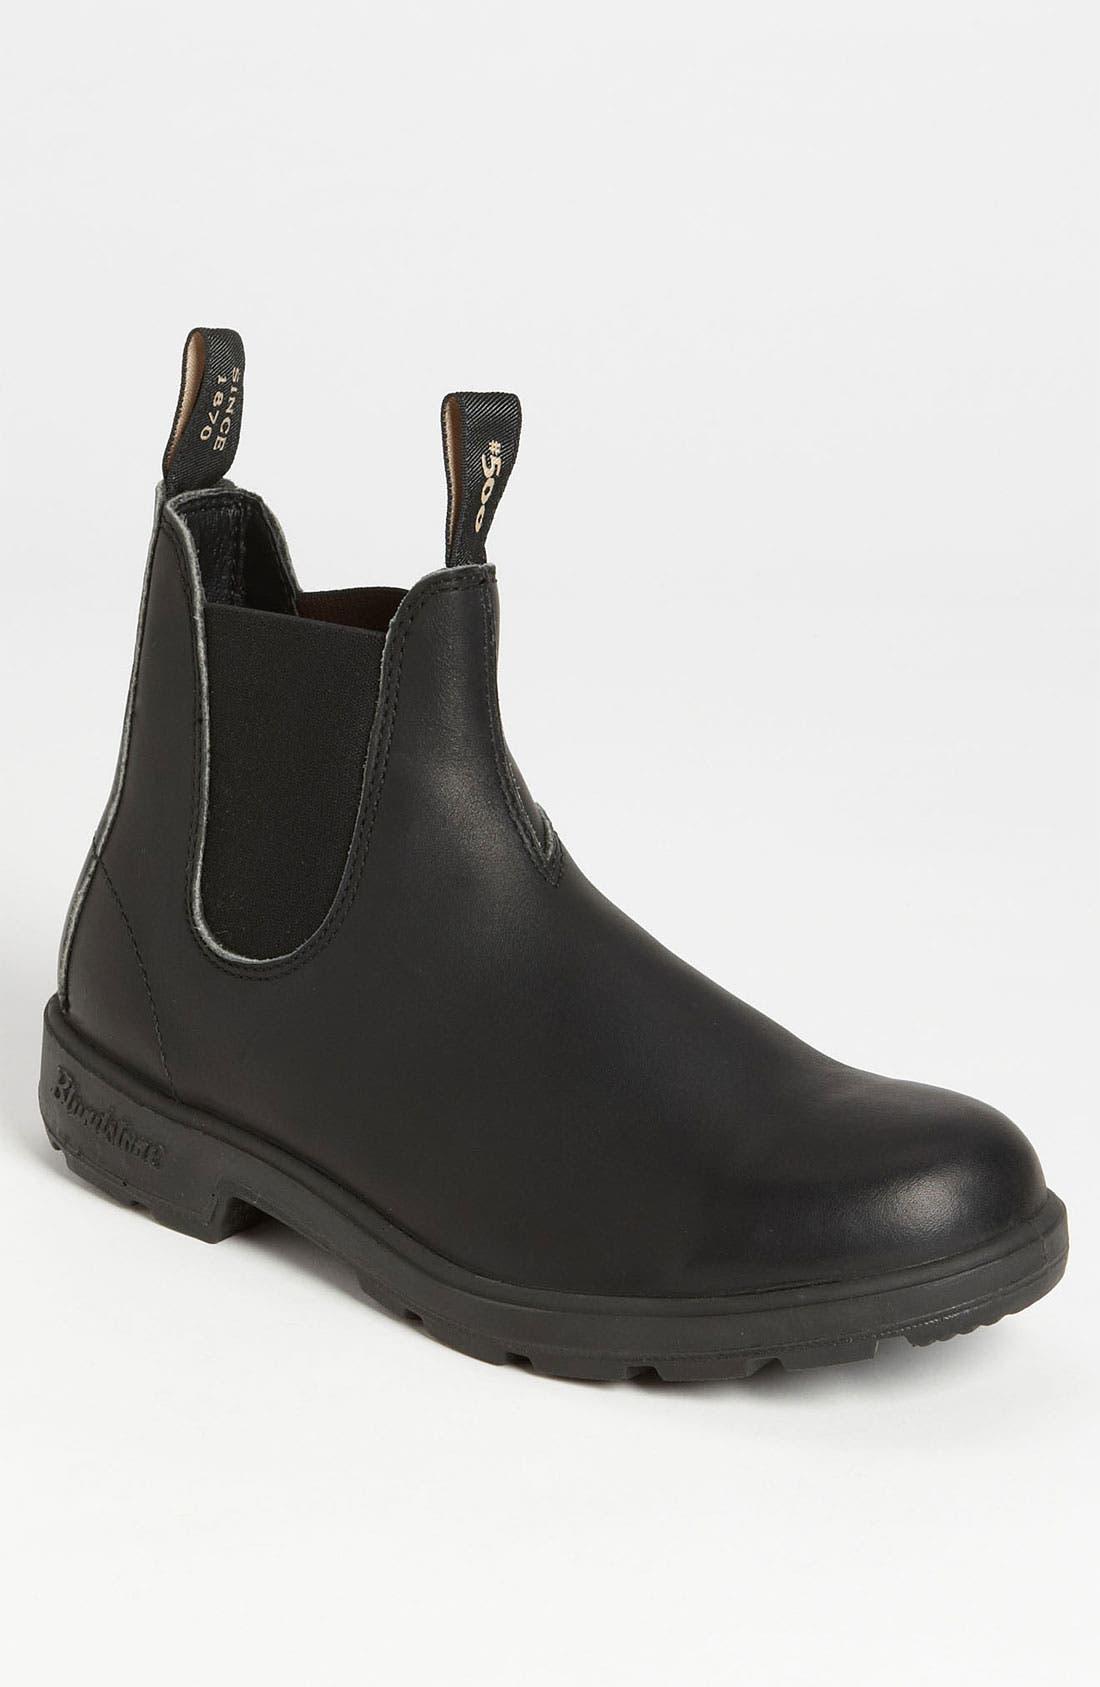 Blundstone Footwear Classic Boot- Black